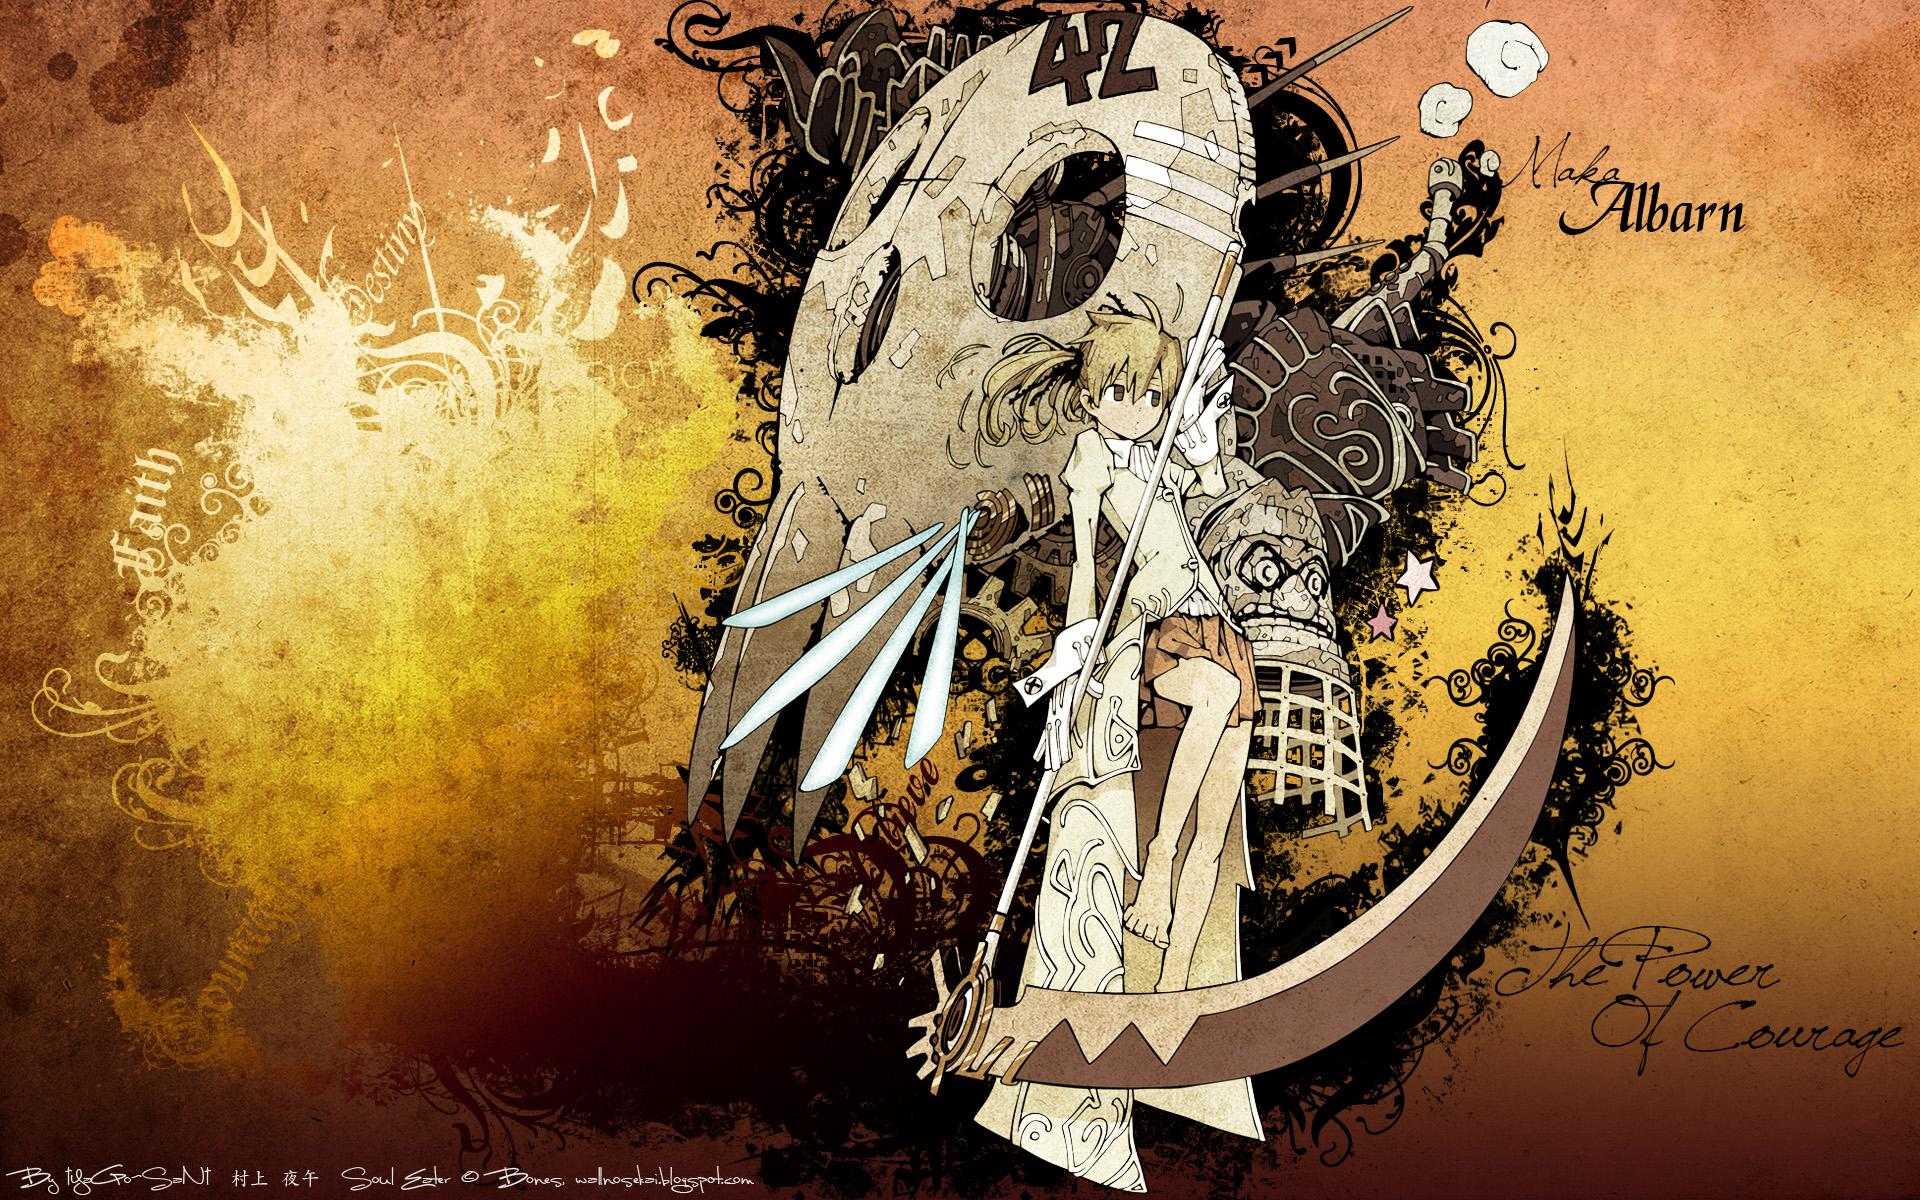 Soul Eater Full HD Sfondo and Sfondi | 1920x1200 | ID:213354